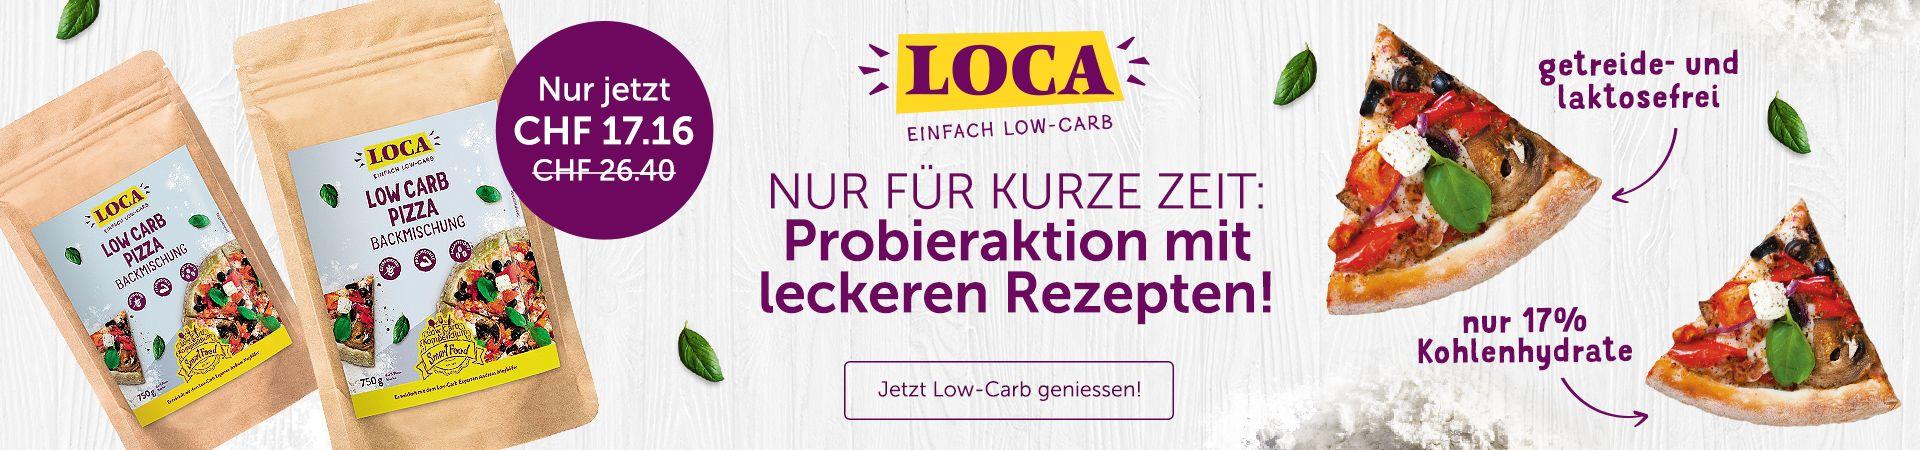 LOCA Low Carb Pizzabachmischung und Pizzadekoration.